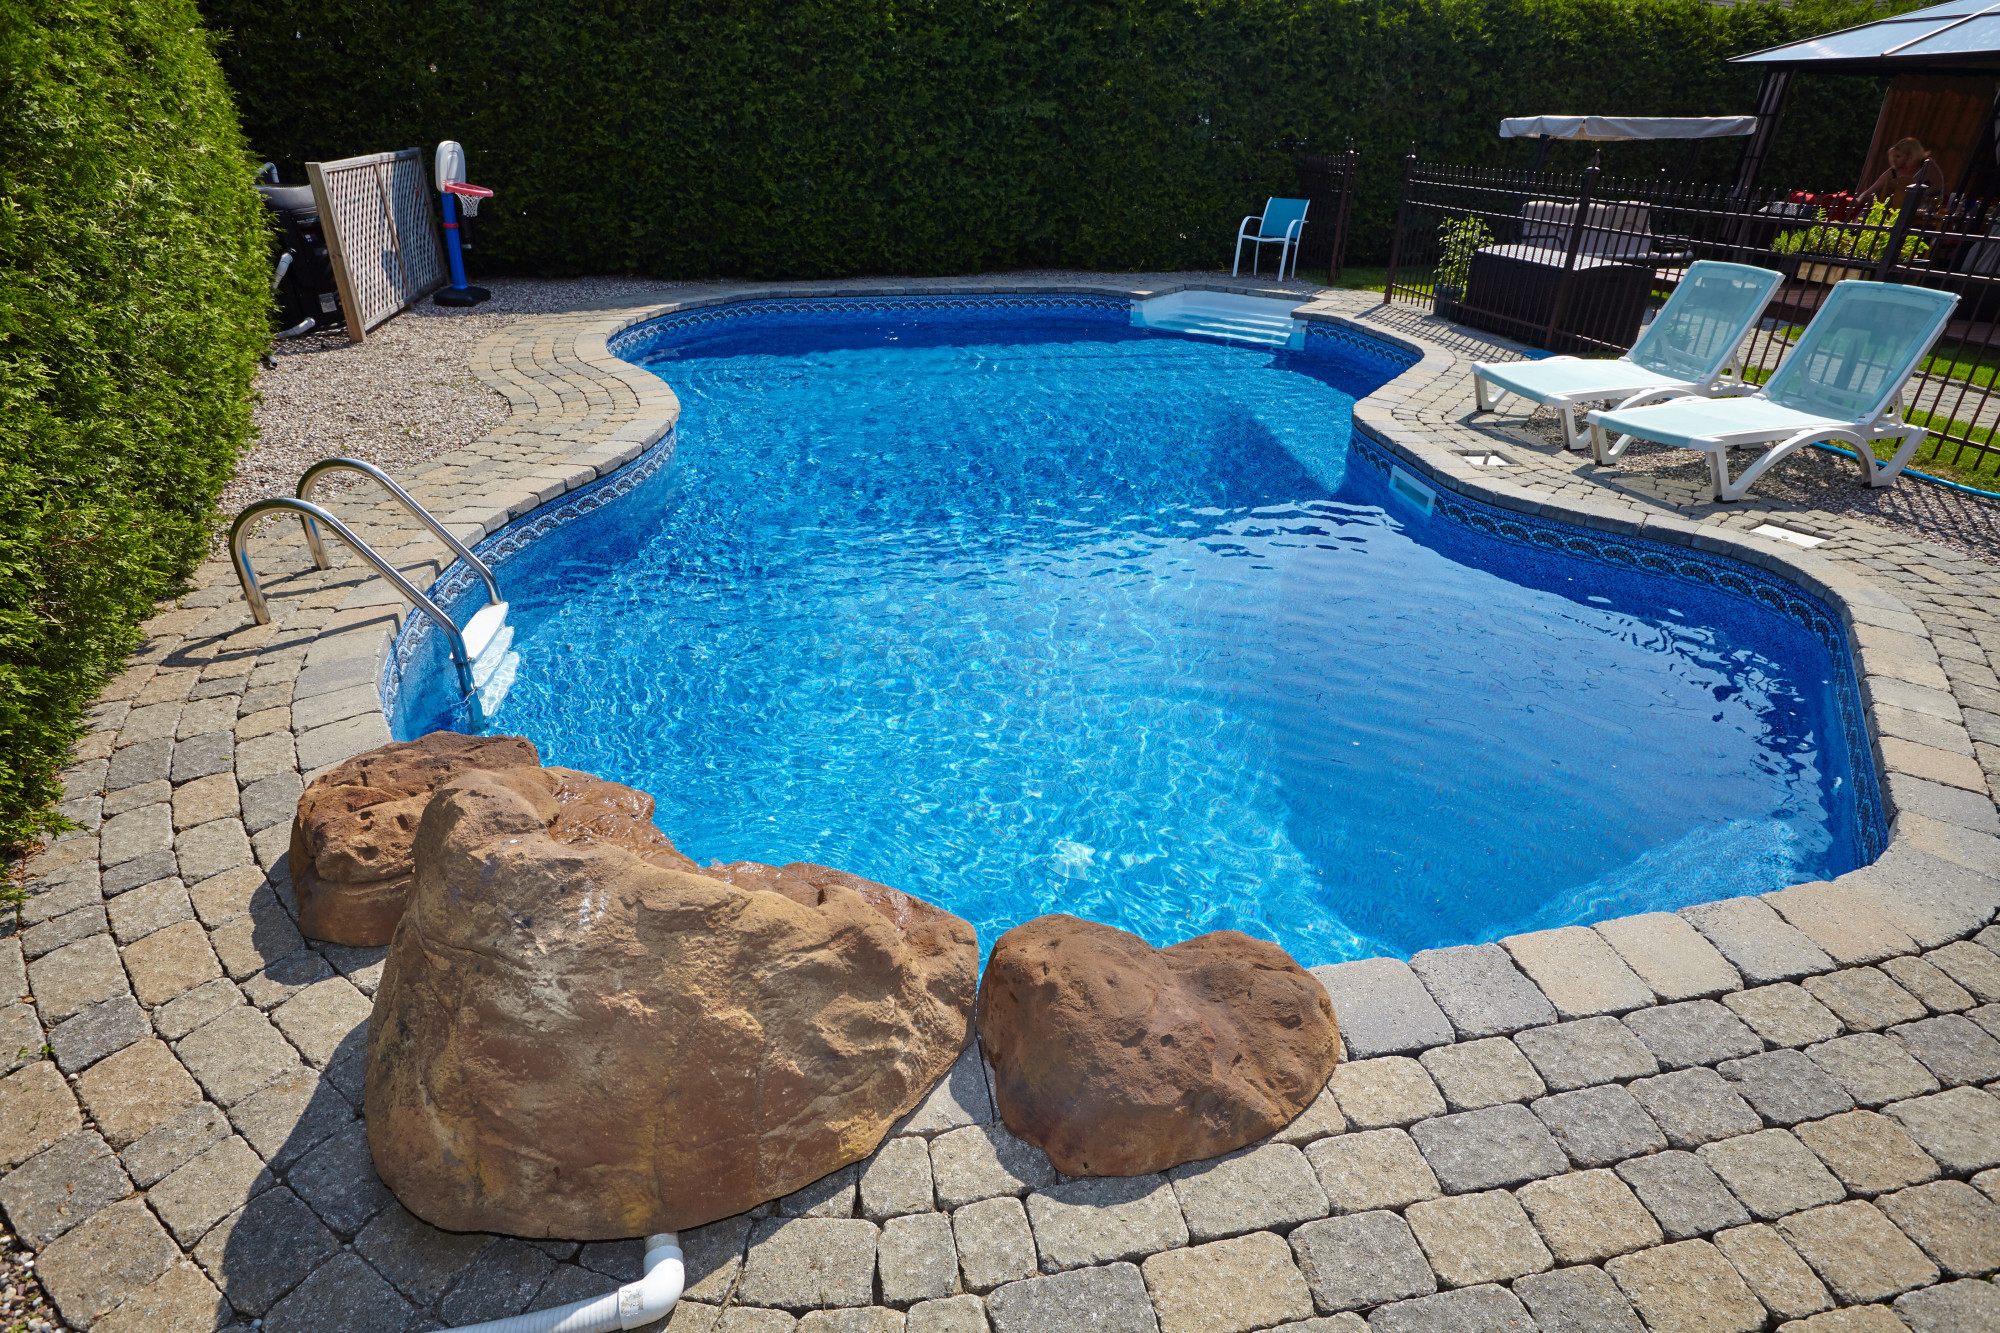 5 Best Backyard Pool Designs Katy Texas Pool Builder Sahara Pools Katy Tx